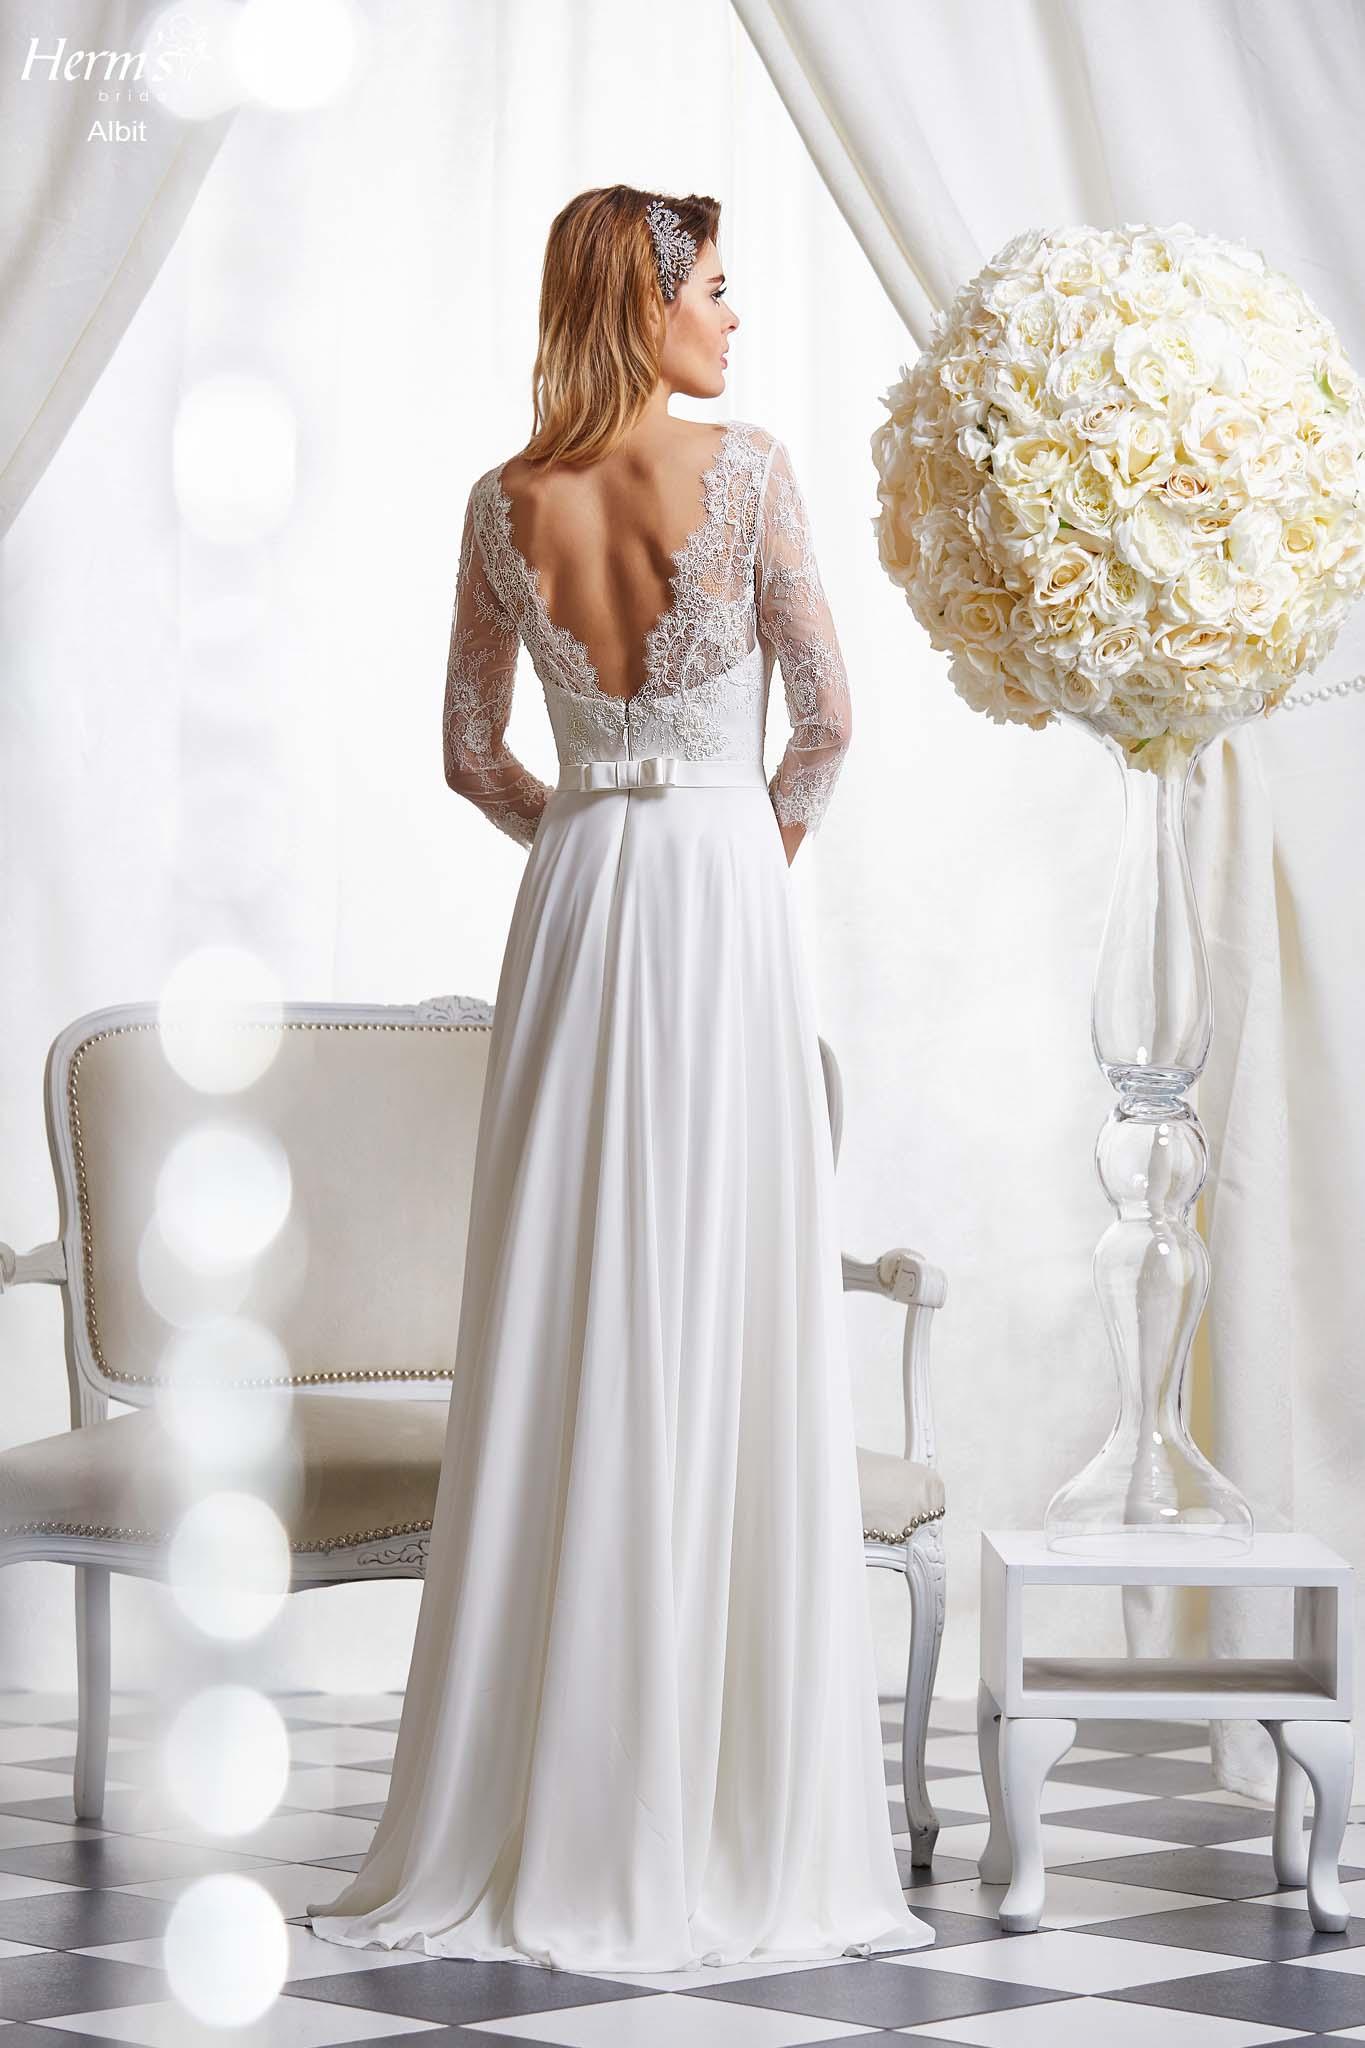 wedding dress Herm's Bridal Albit